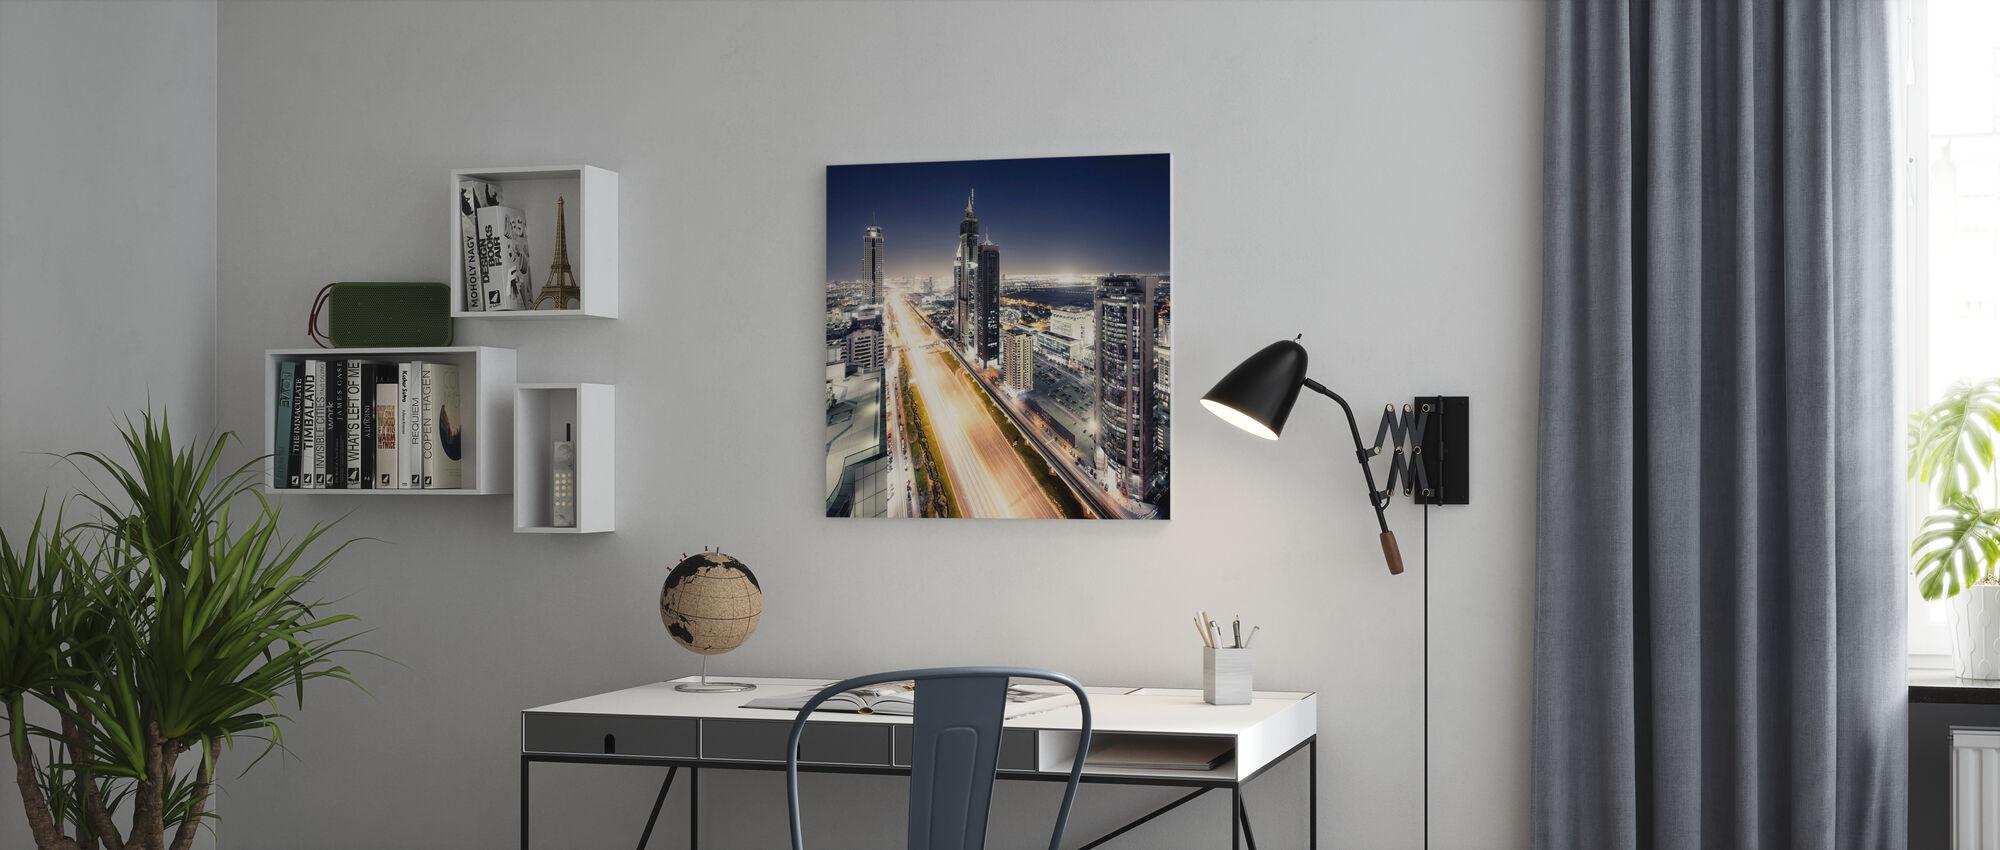 Dubai by Night - Canvas print - Office